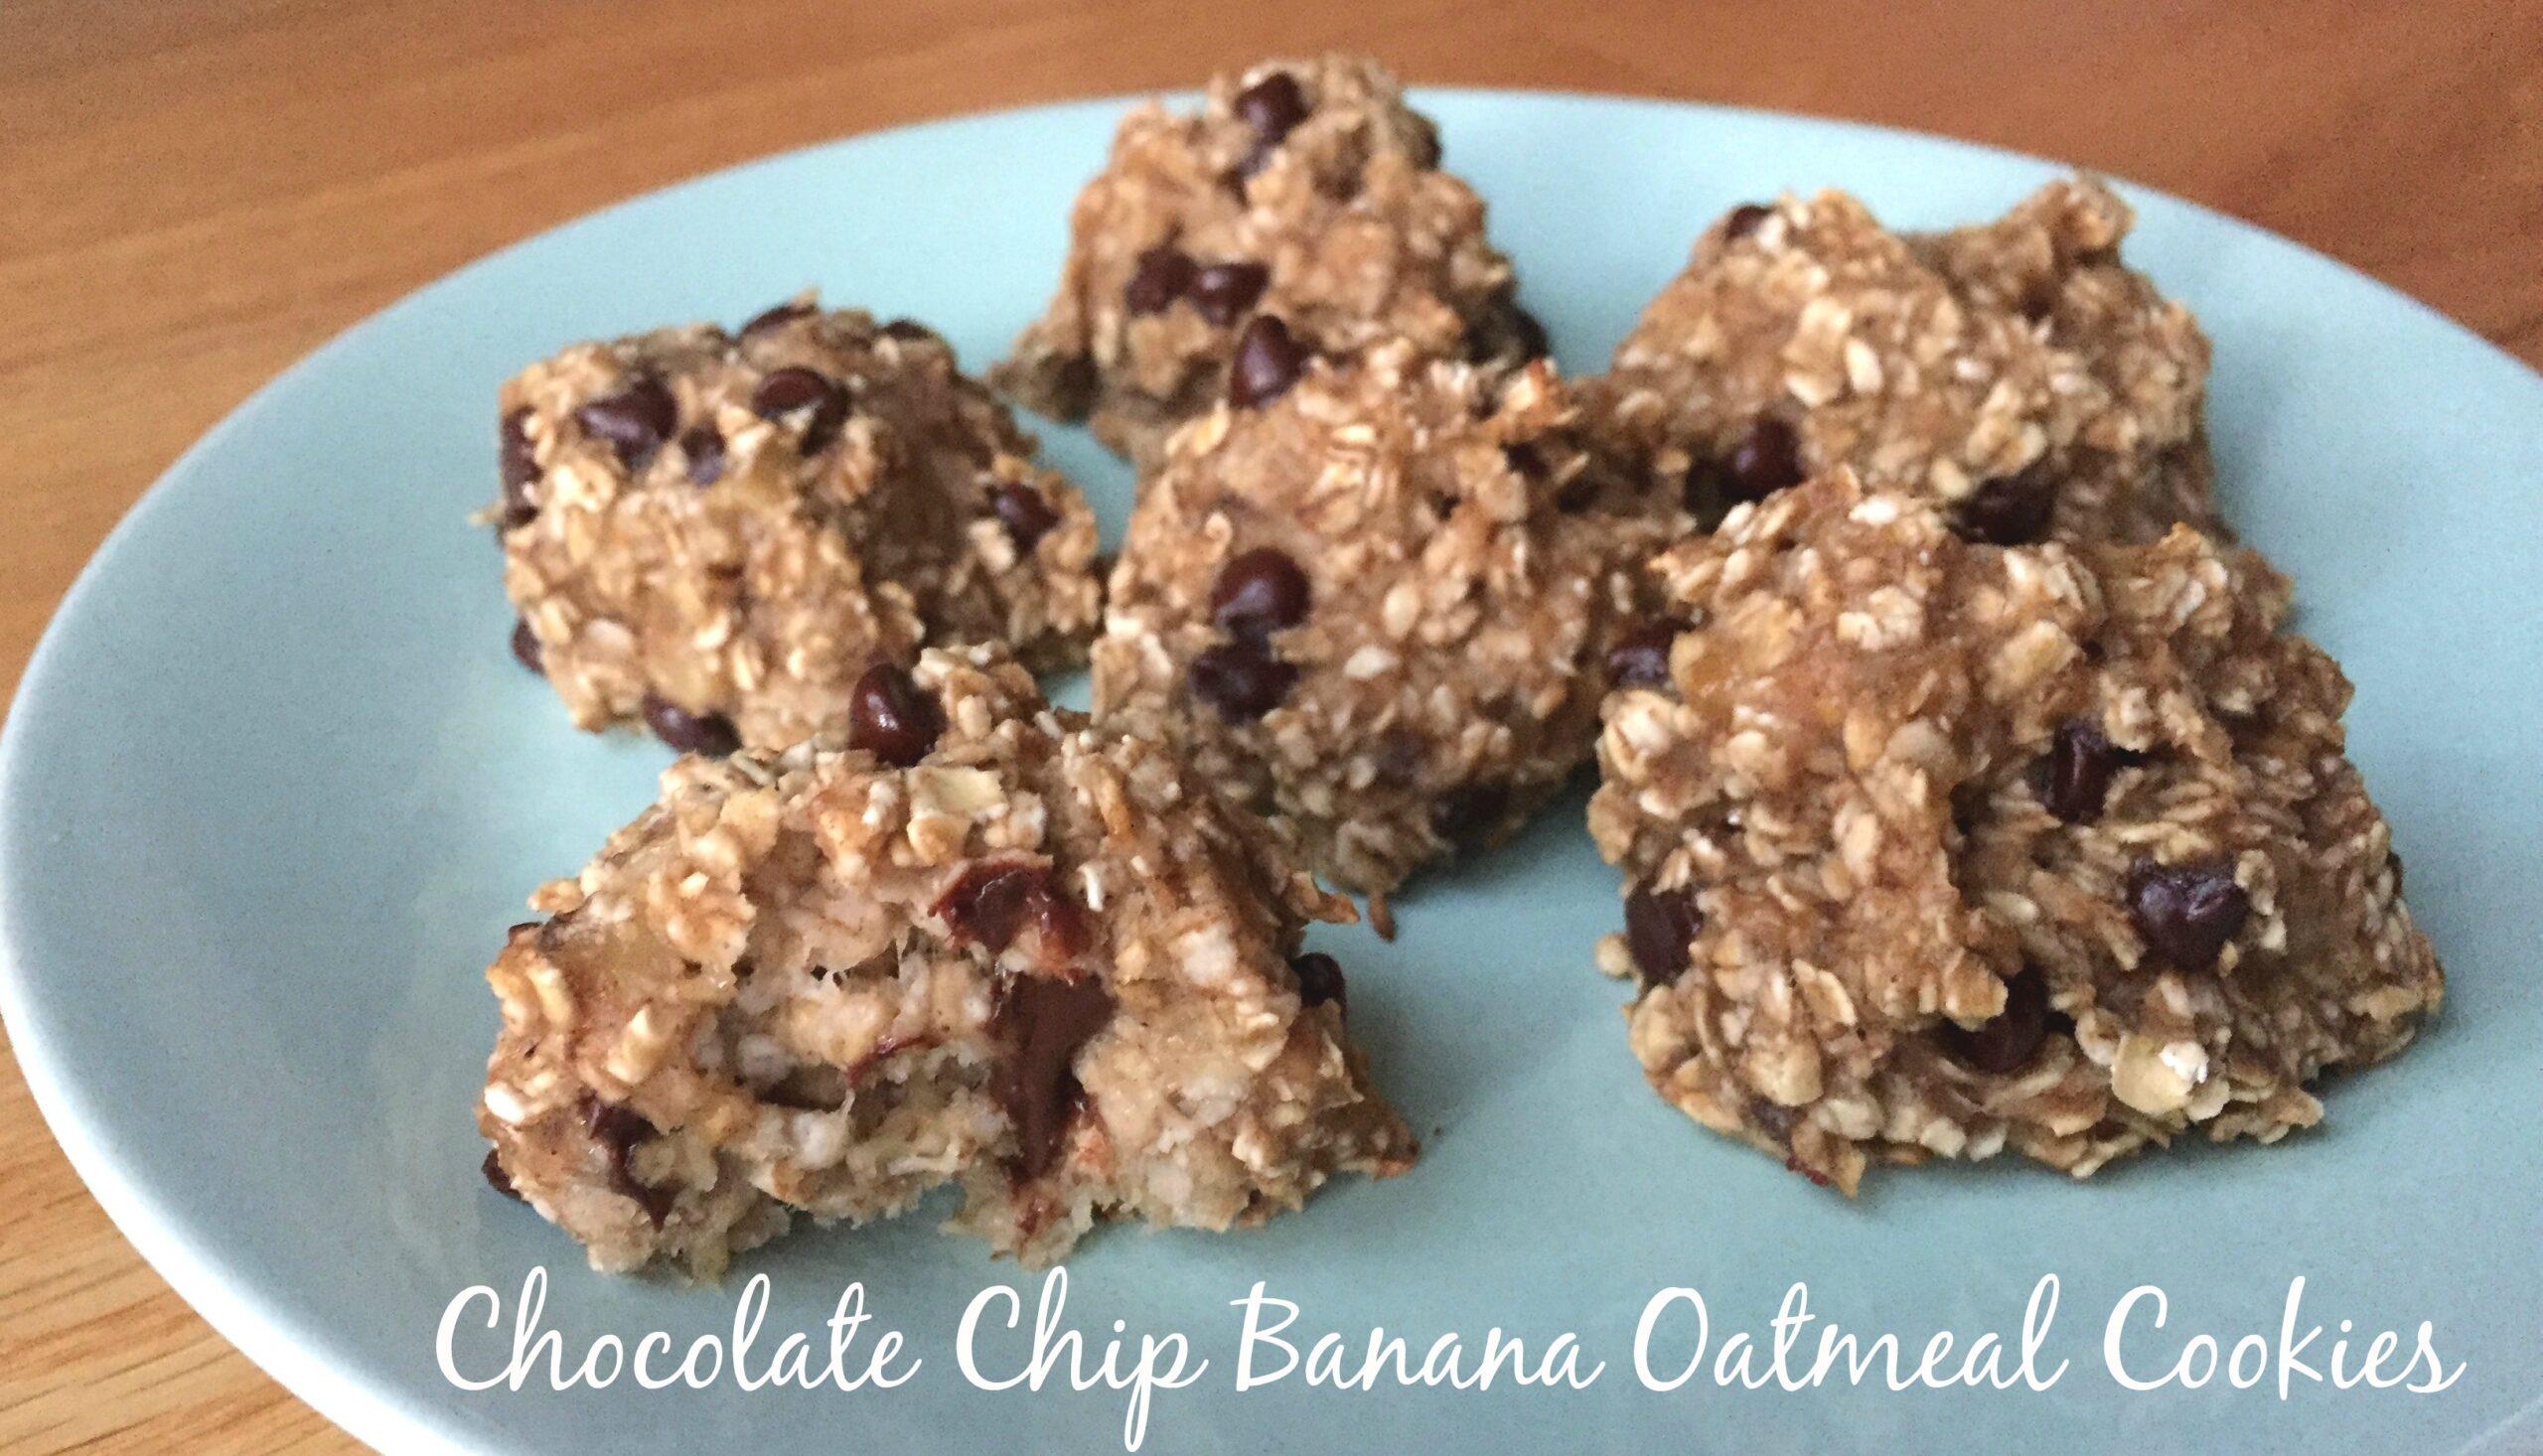 Vegan chocolate chip banana oatmeal cookies